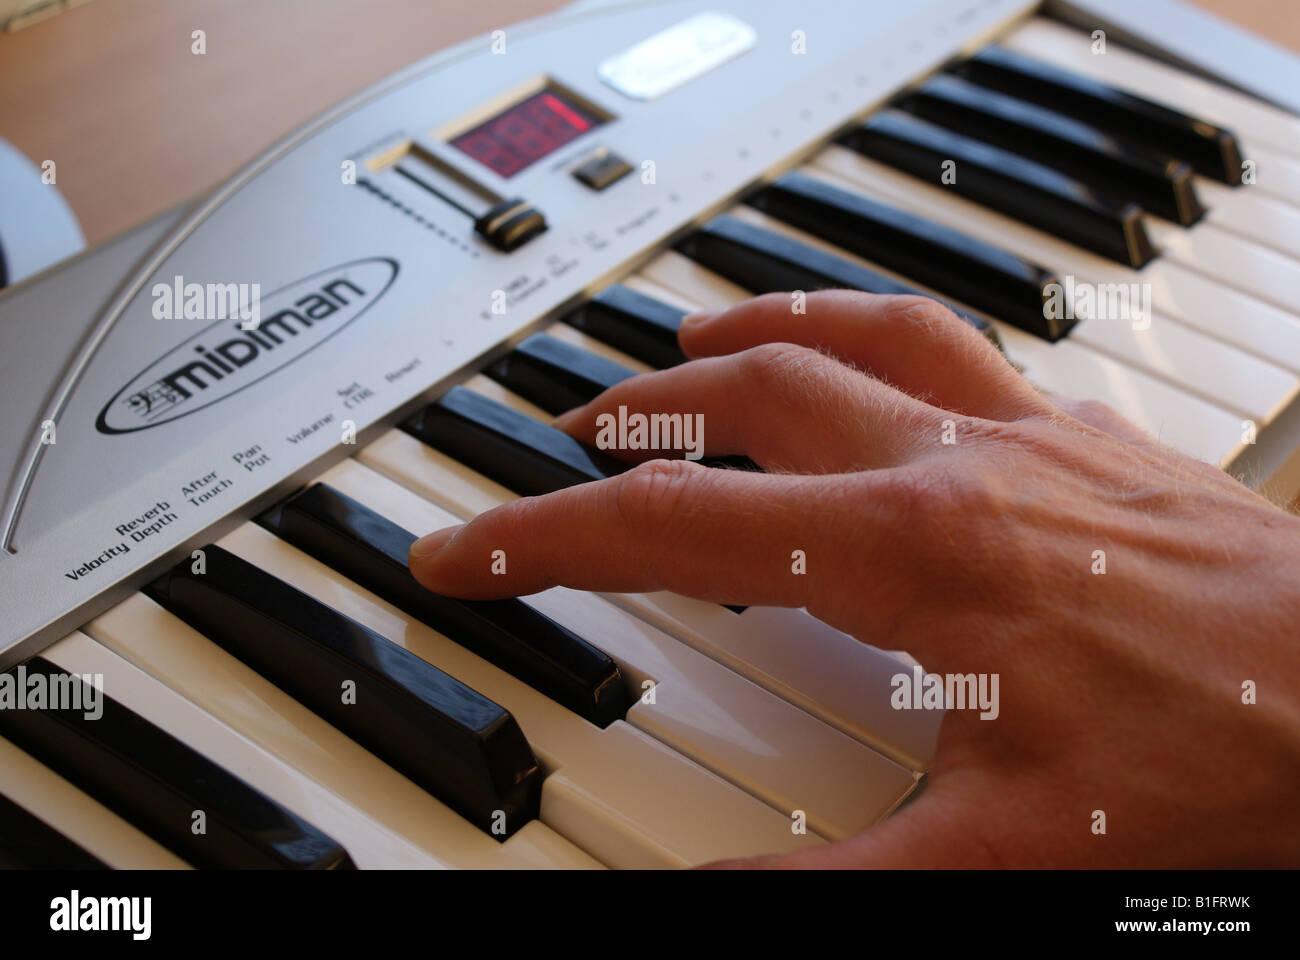 Hand playing keyboard - Stock Image